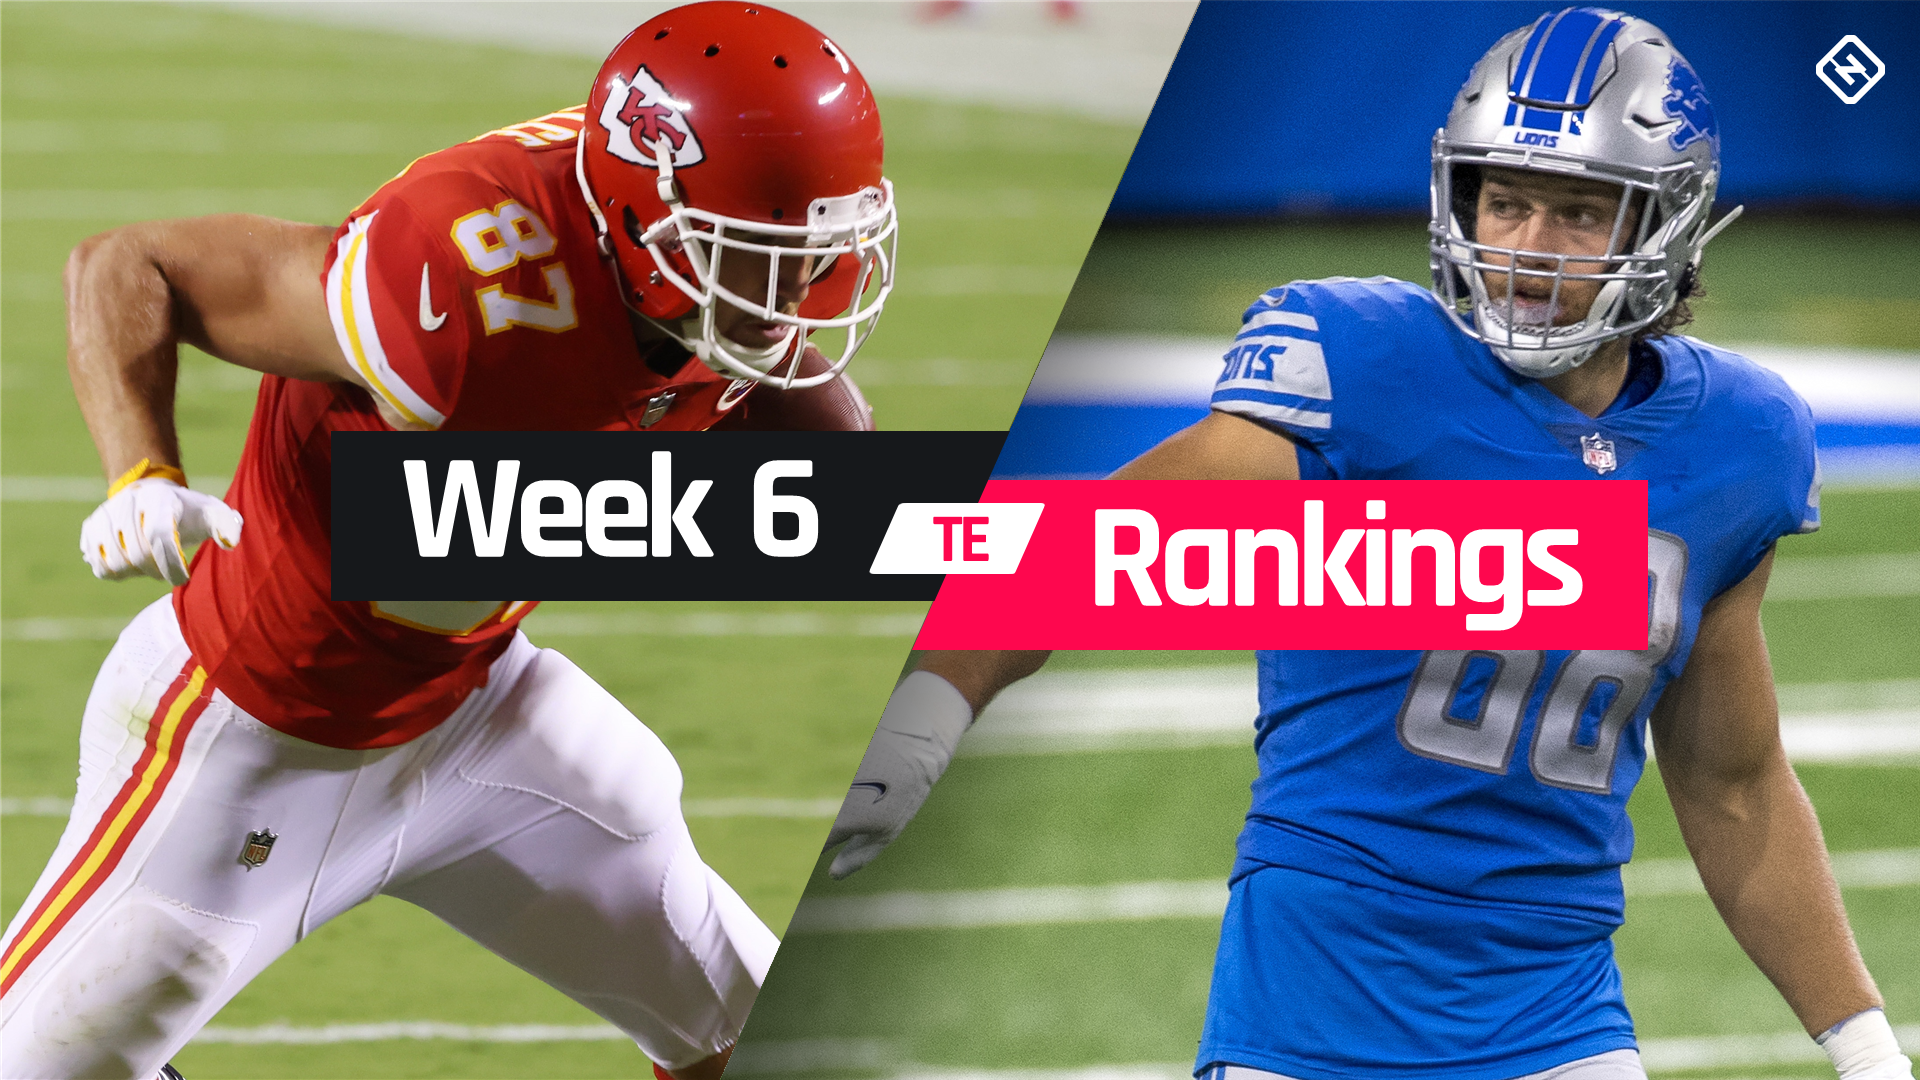 Week 6 Fantasy Football Tight End Rankings